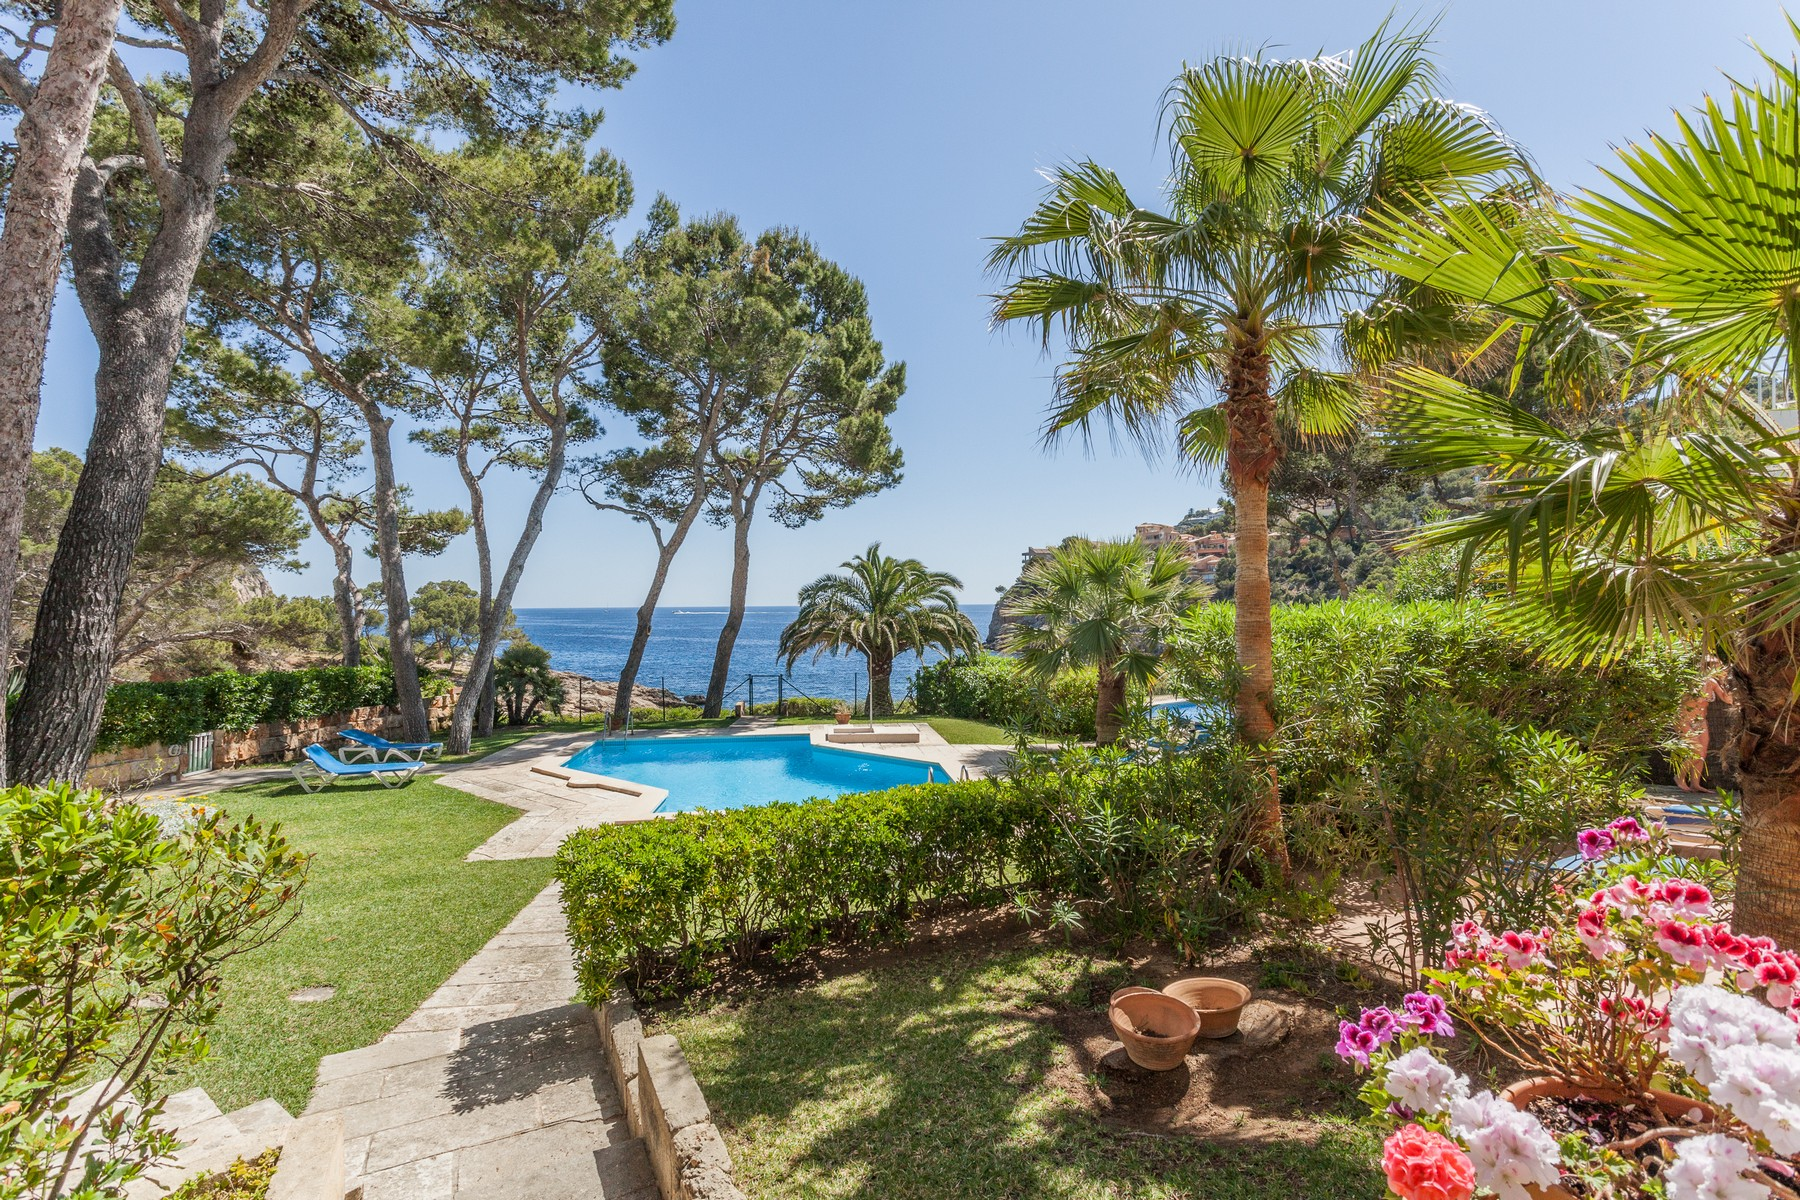 Wohnung für Verkauf beim Apartment with sea access near the port of Andratx Port Andratx, Mallorca 07157 Spanien